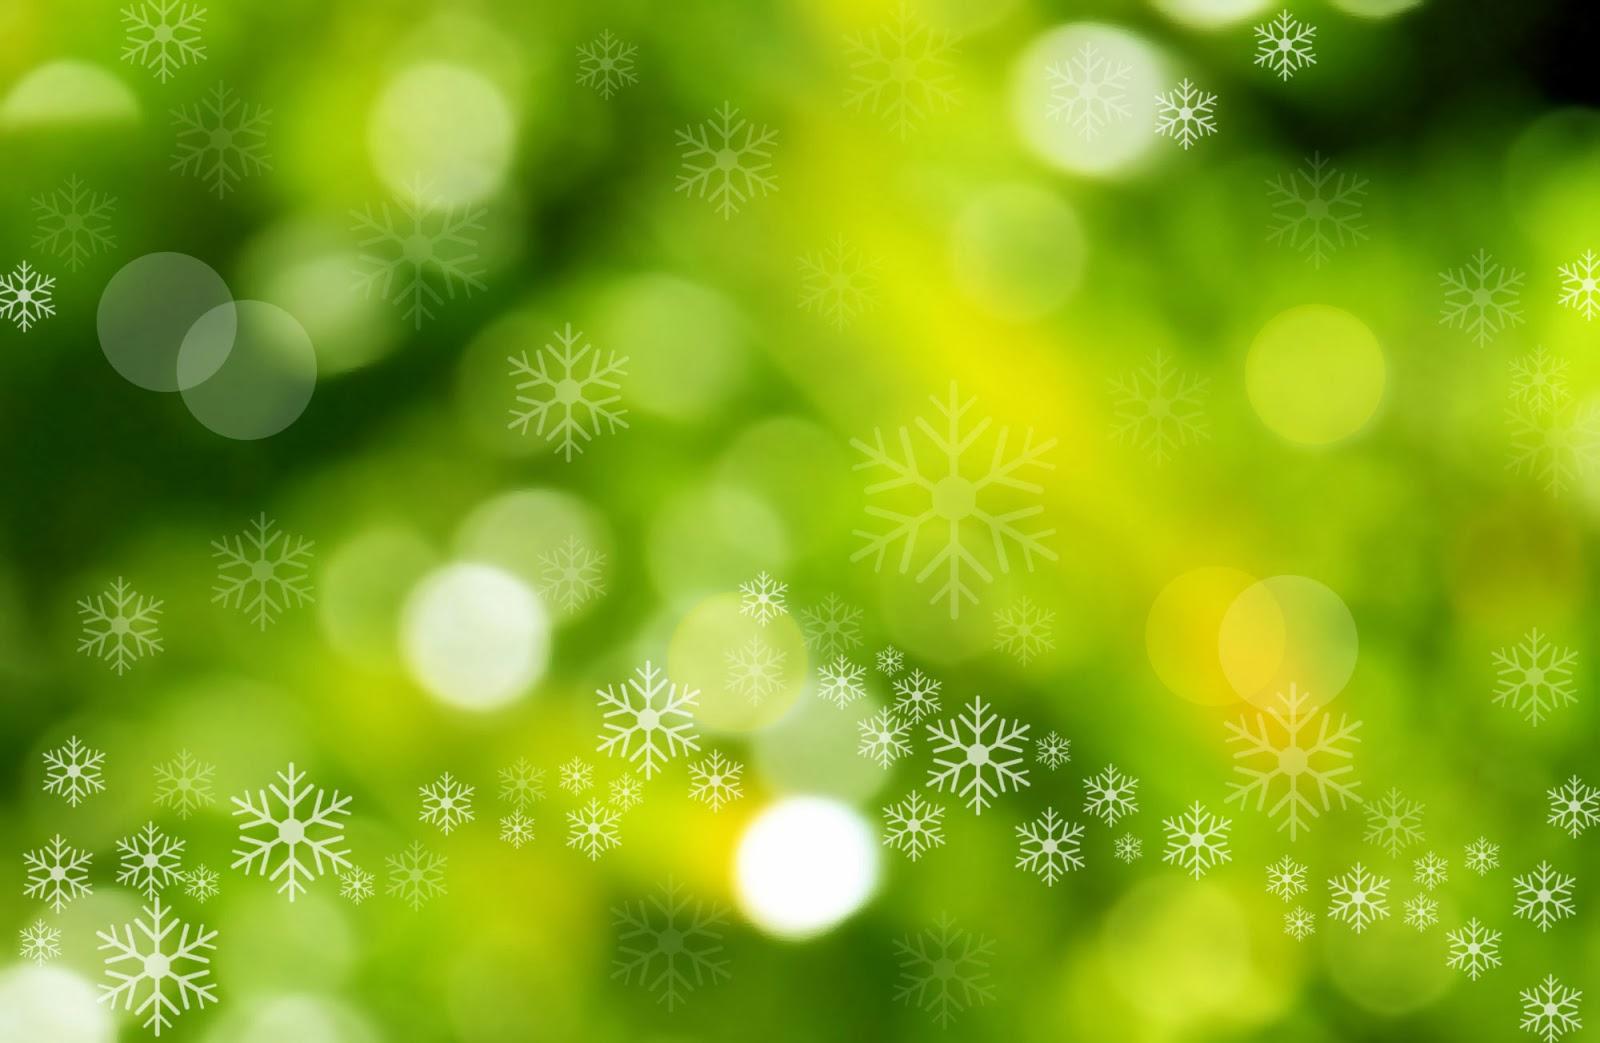 green christmas wallpaper - photo #2